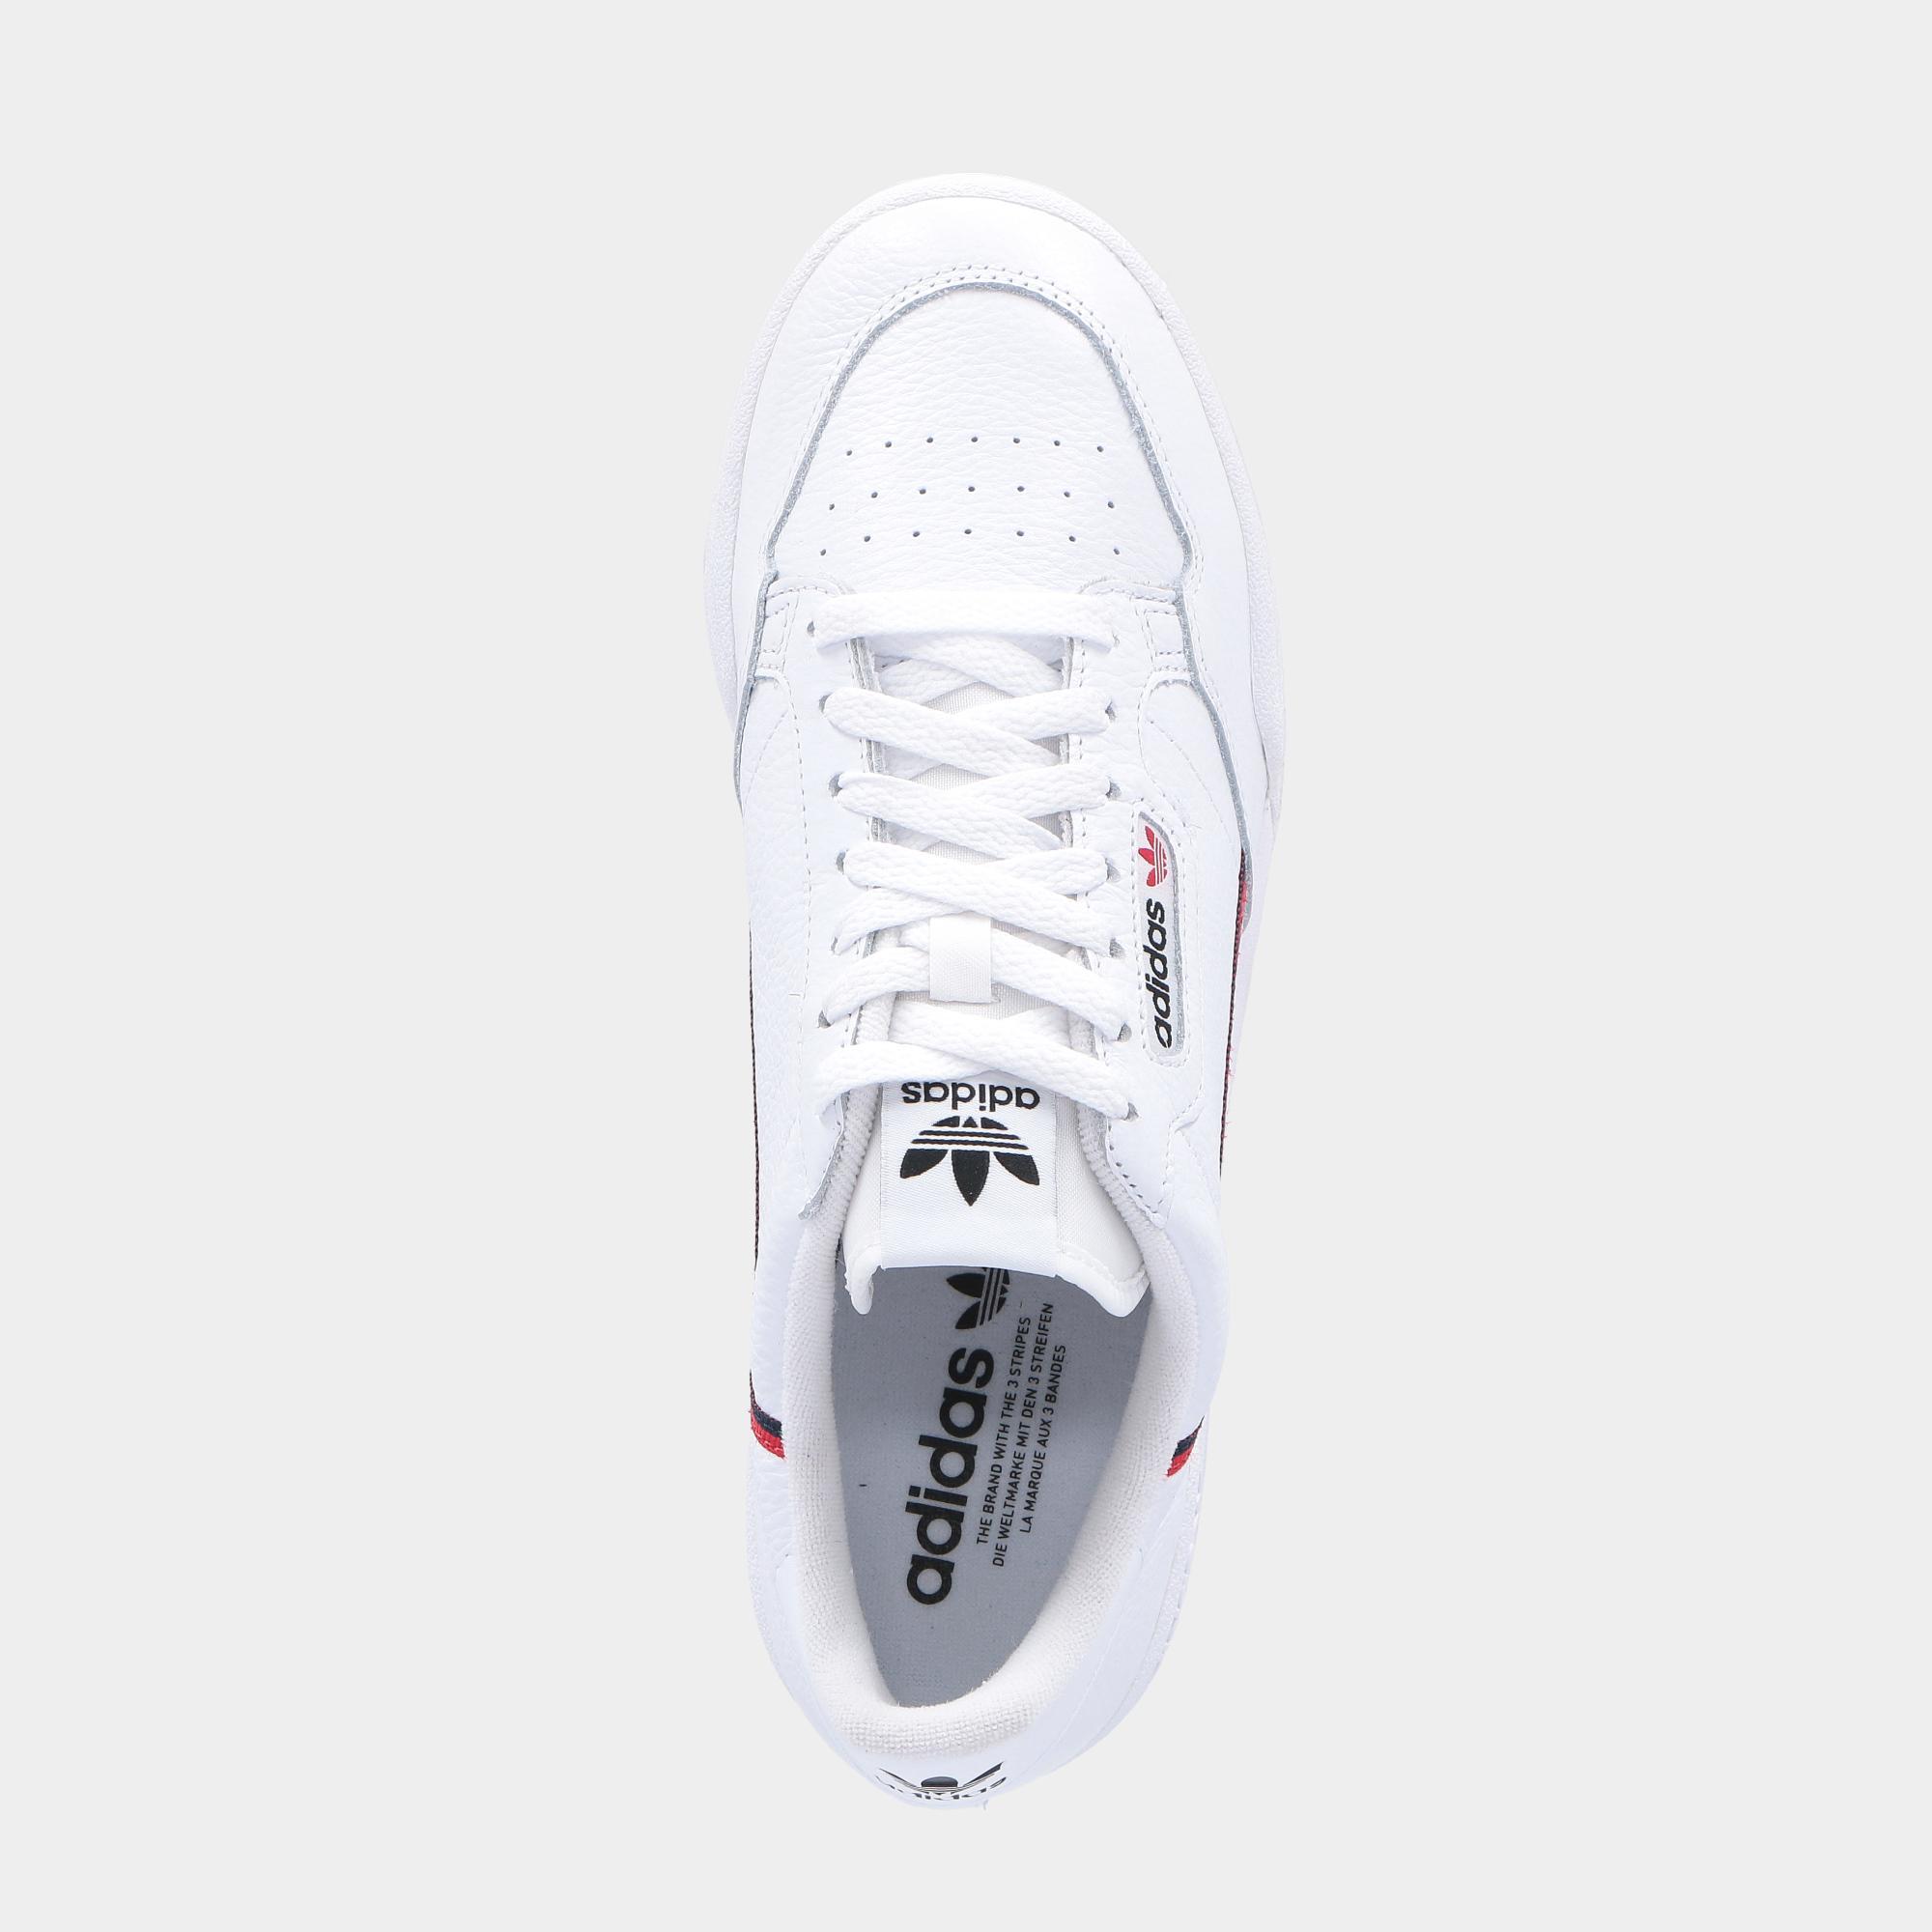 Adidas Continental 80 White scarlet navy